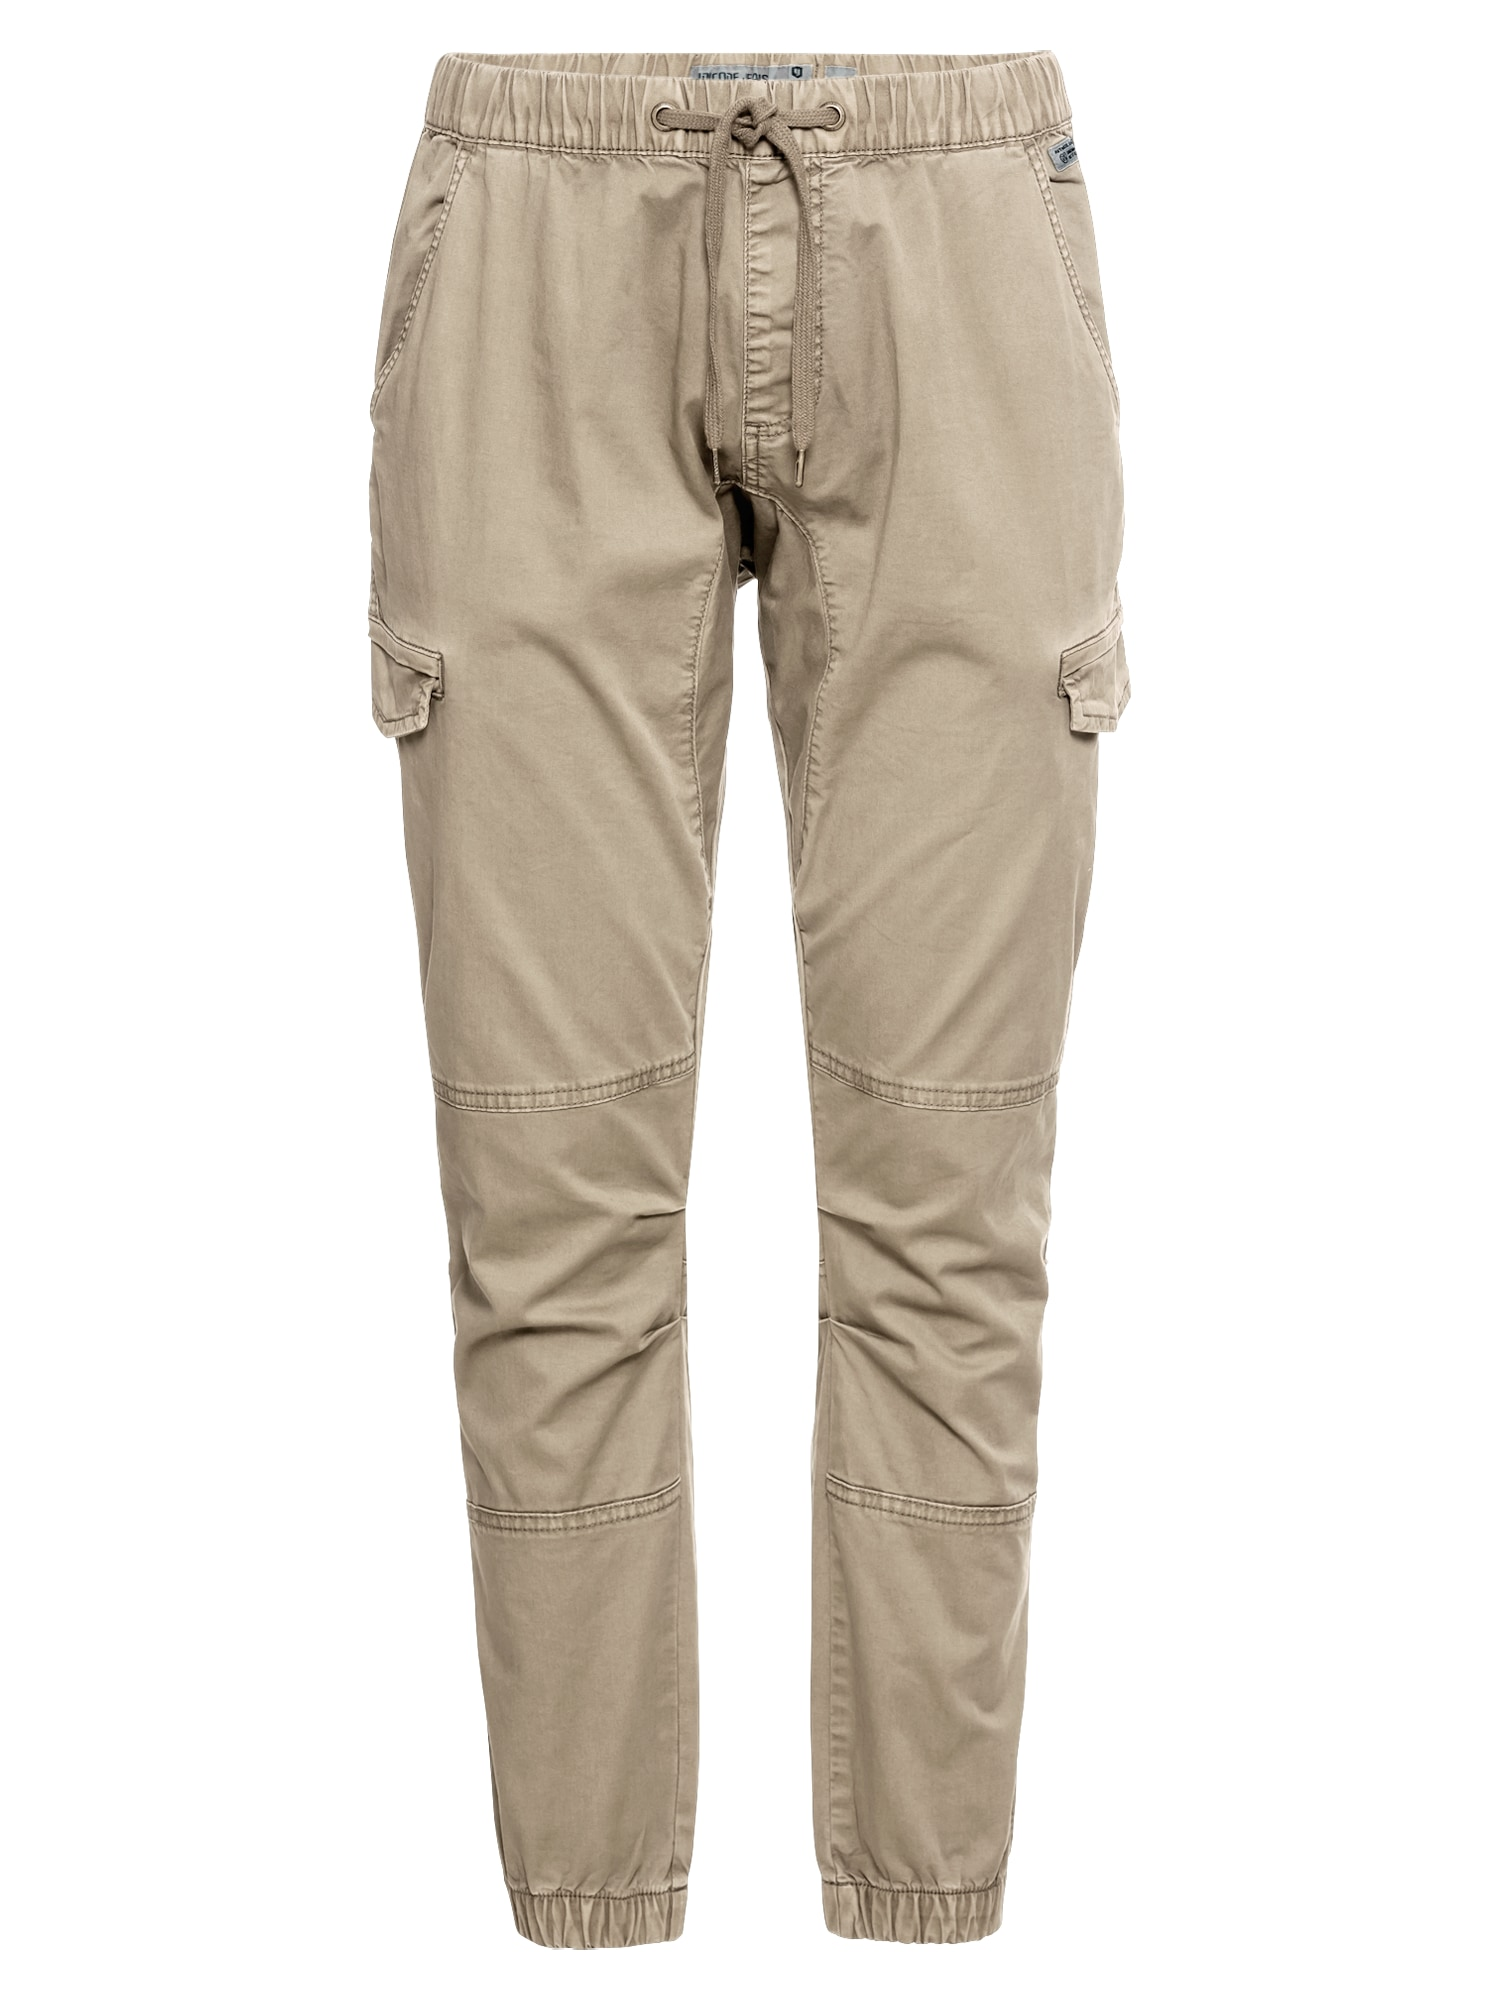 INDICODE JEANS Laisvo stiliaus kelnės 'Levy' kremo